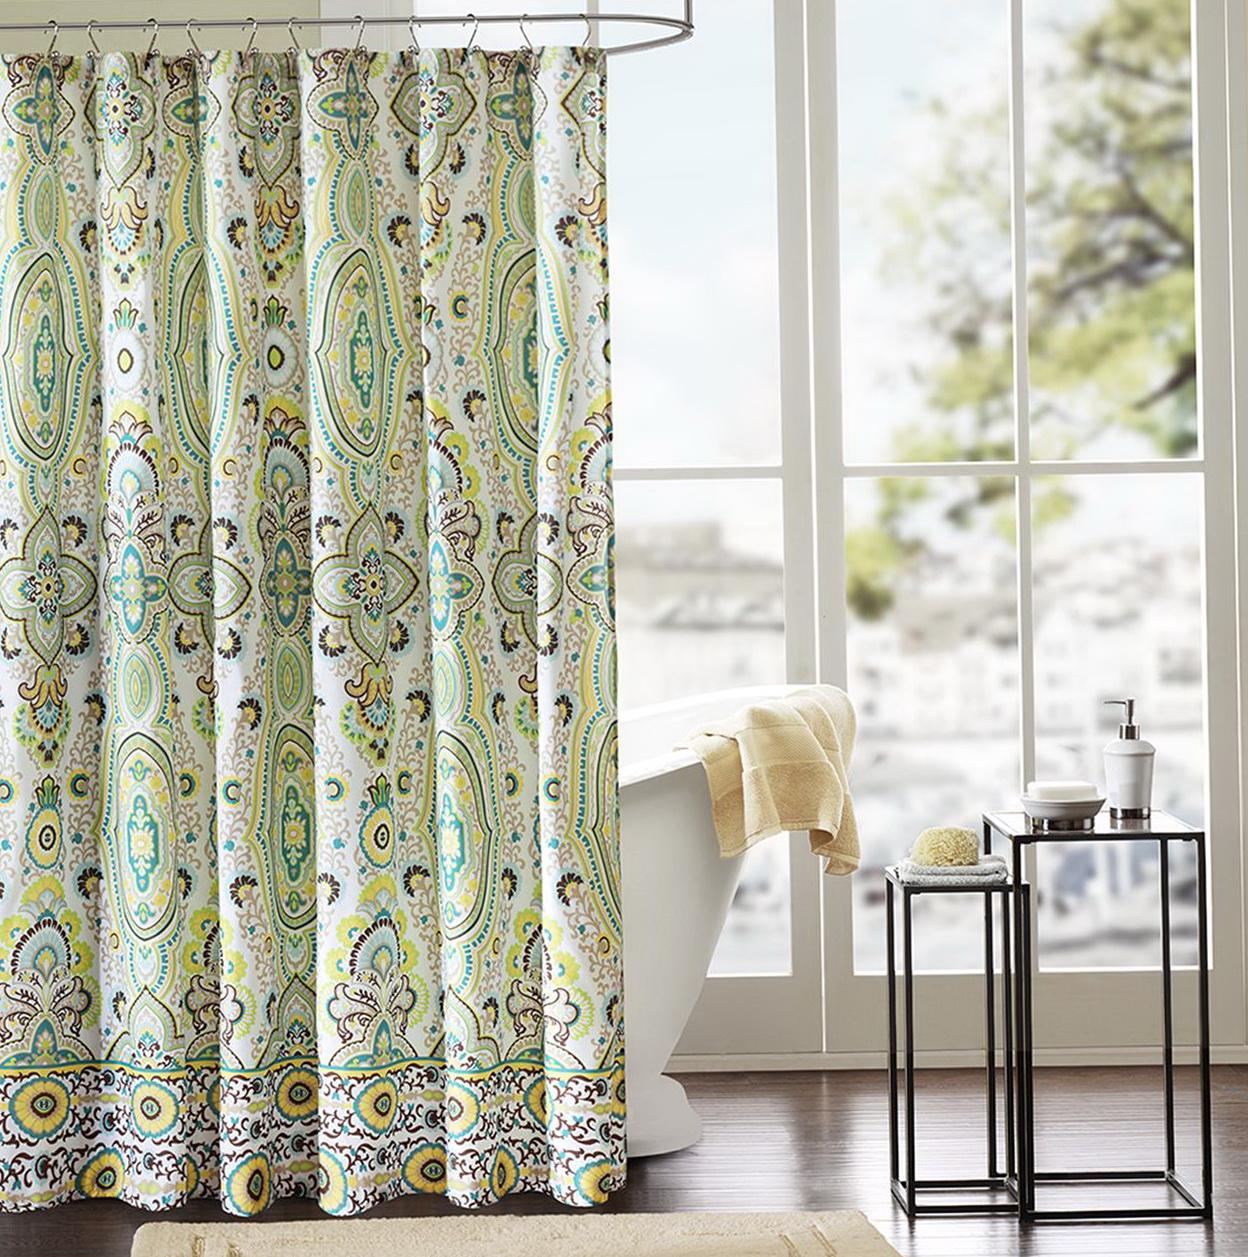 Fancy Shower Curtains Designs Home Design Ideas